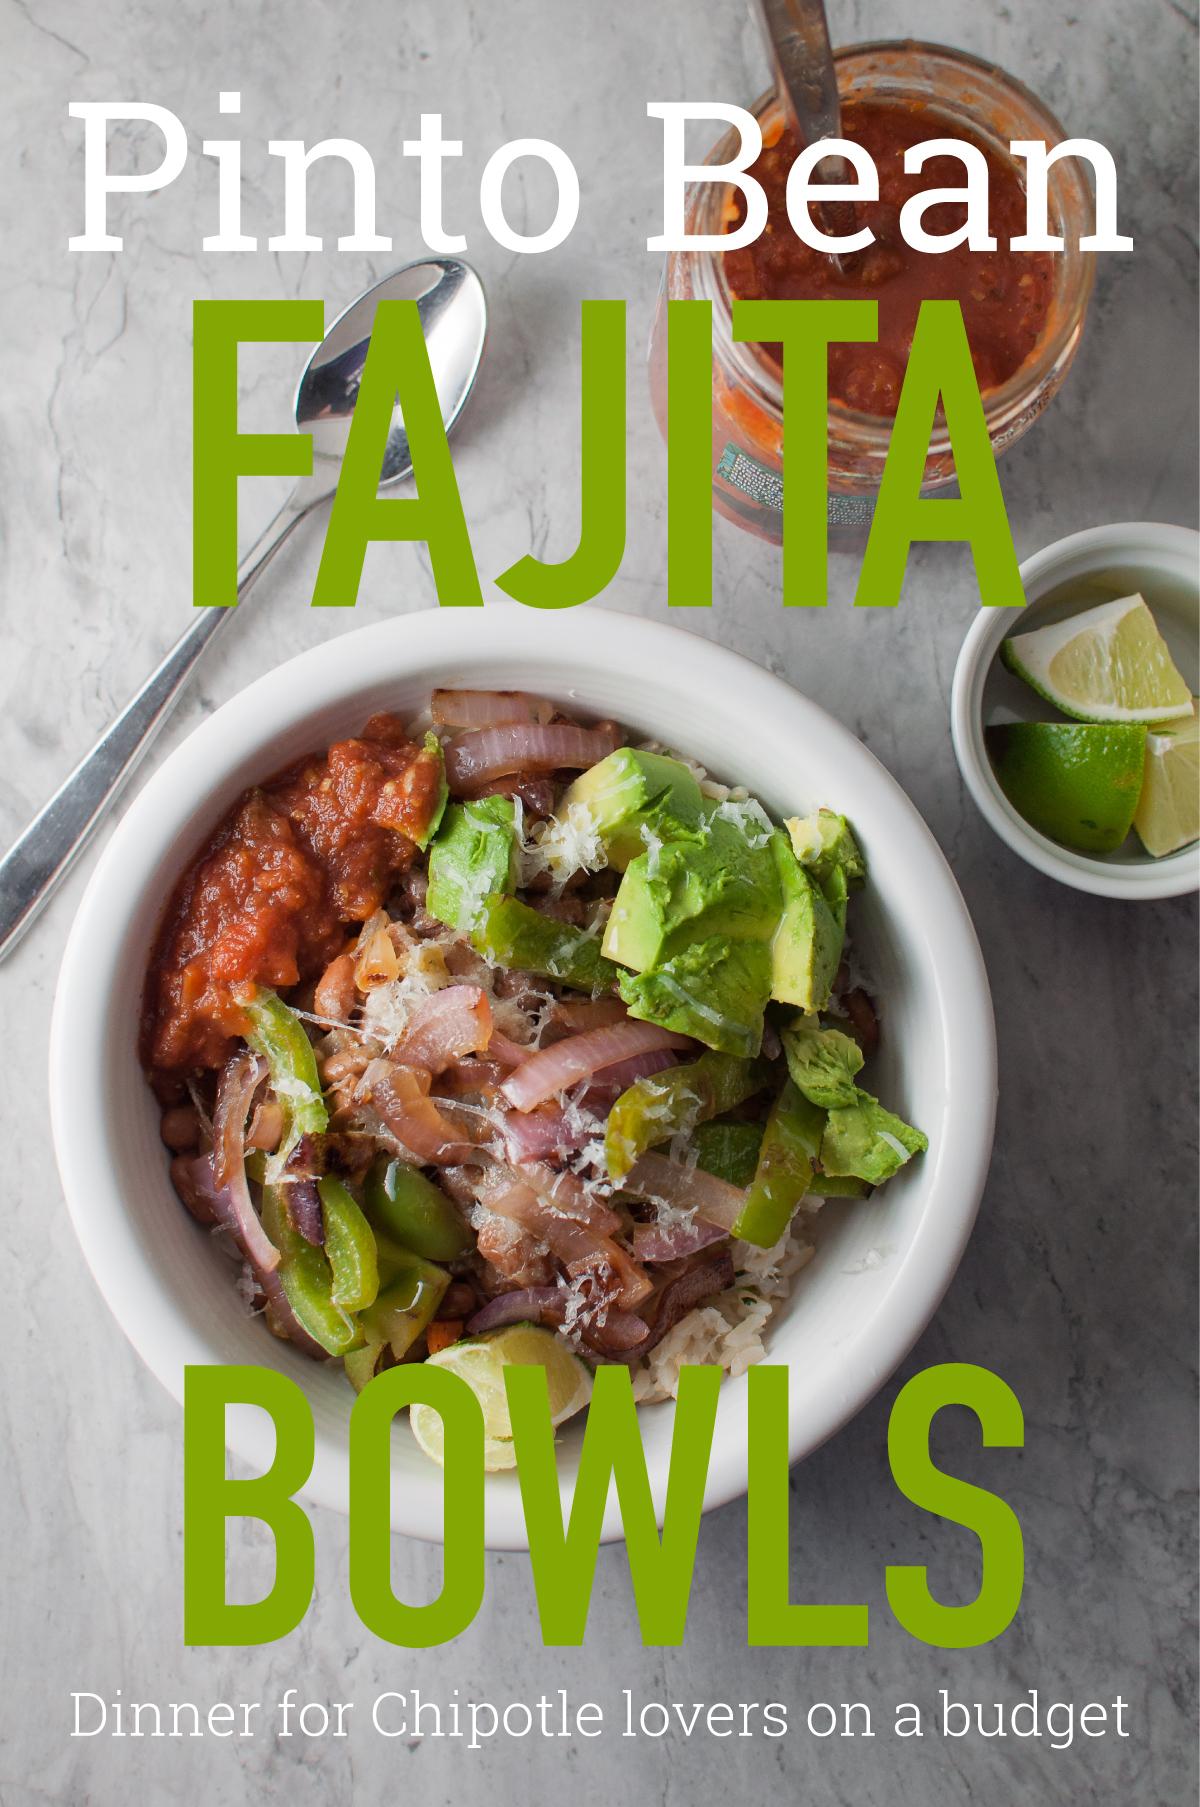 Pinto bean fajita bowls recipe